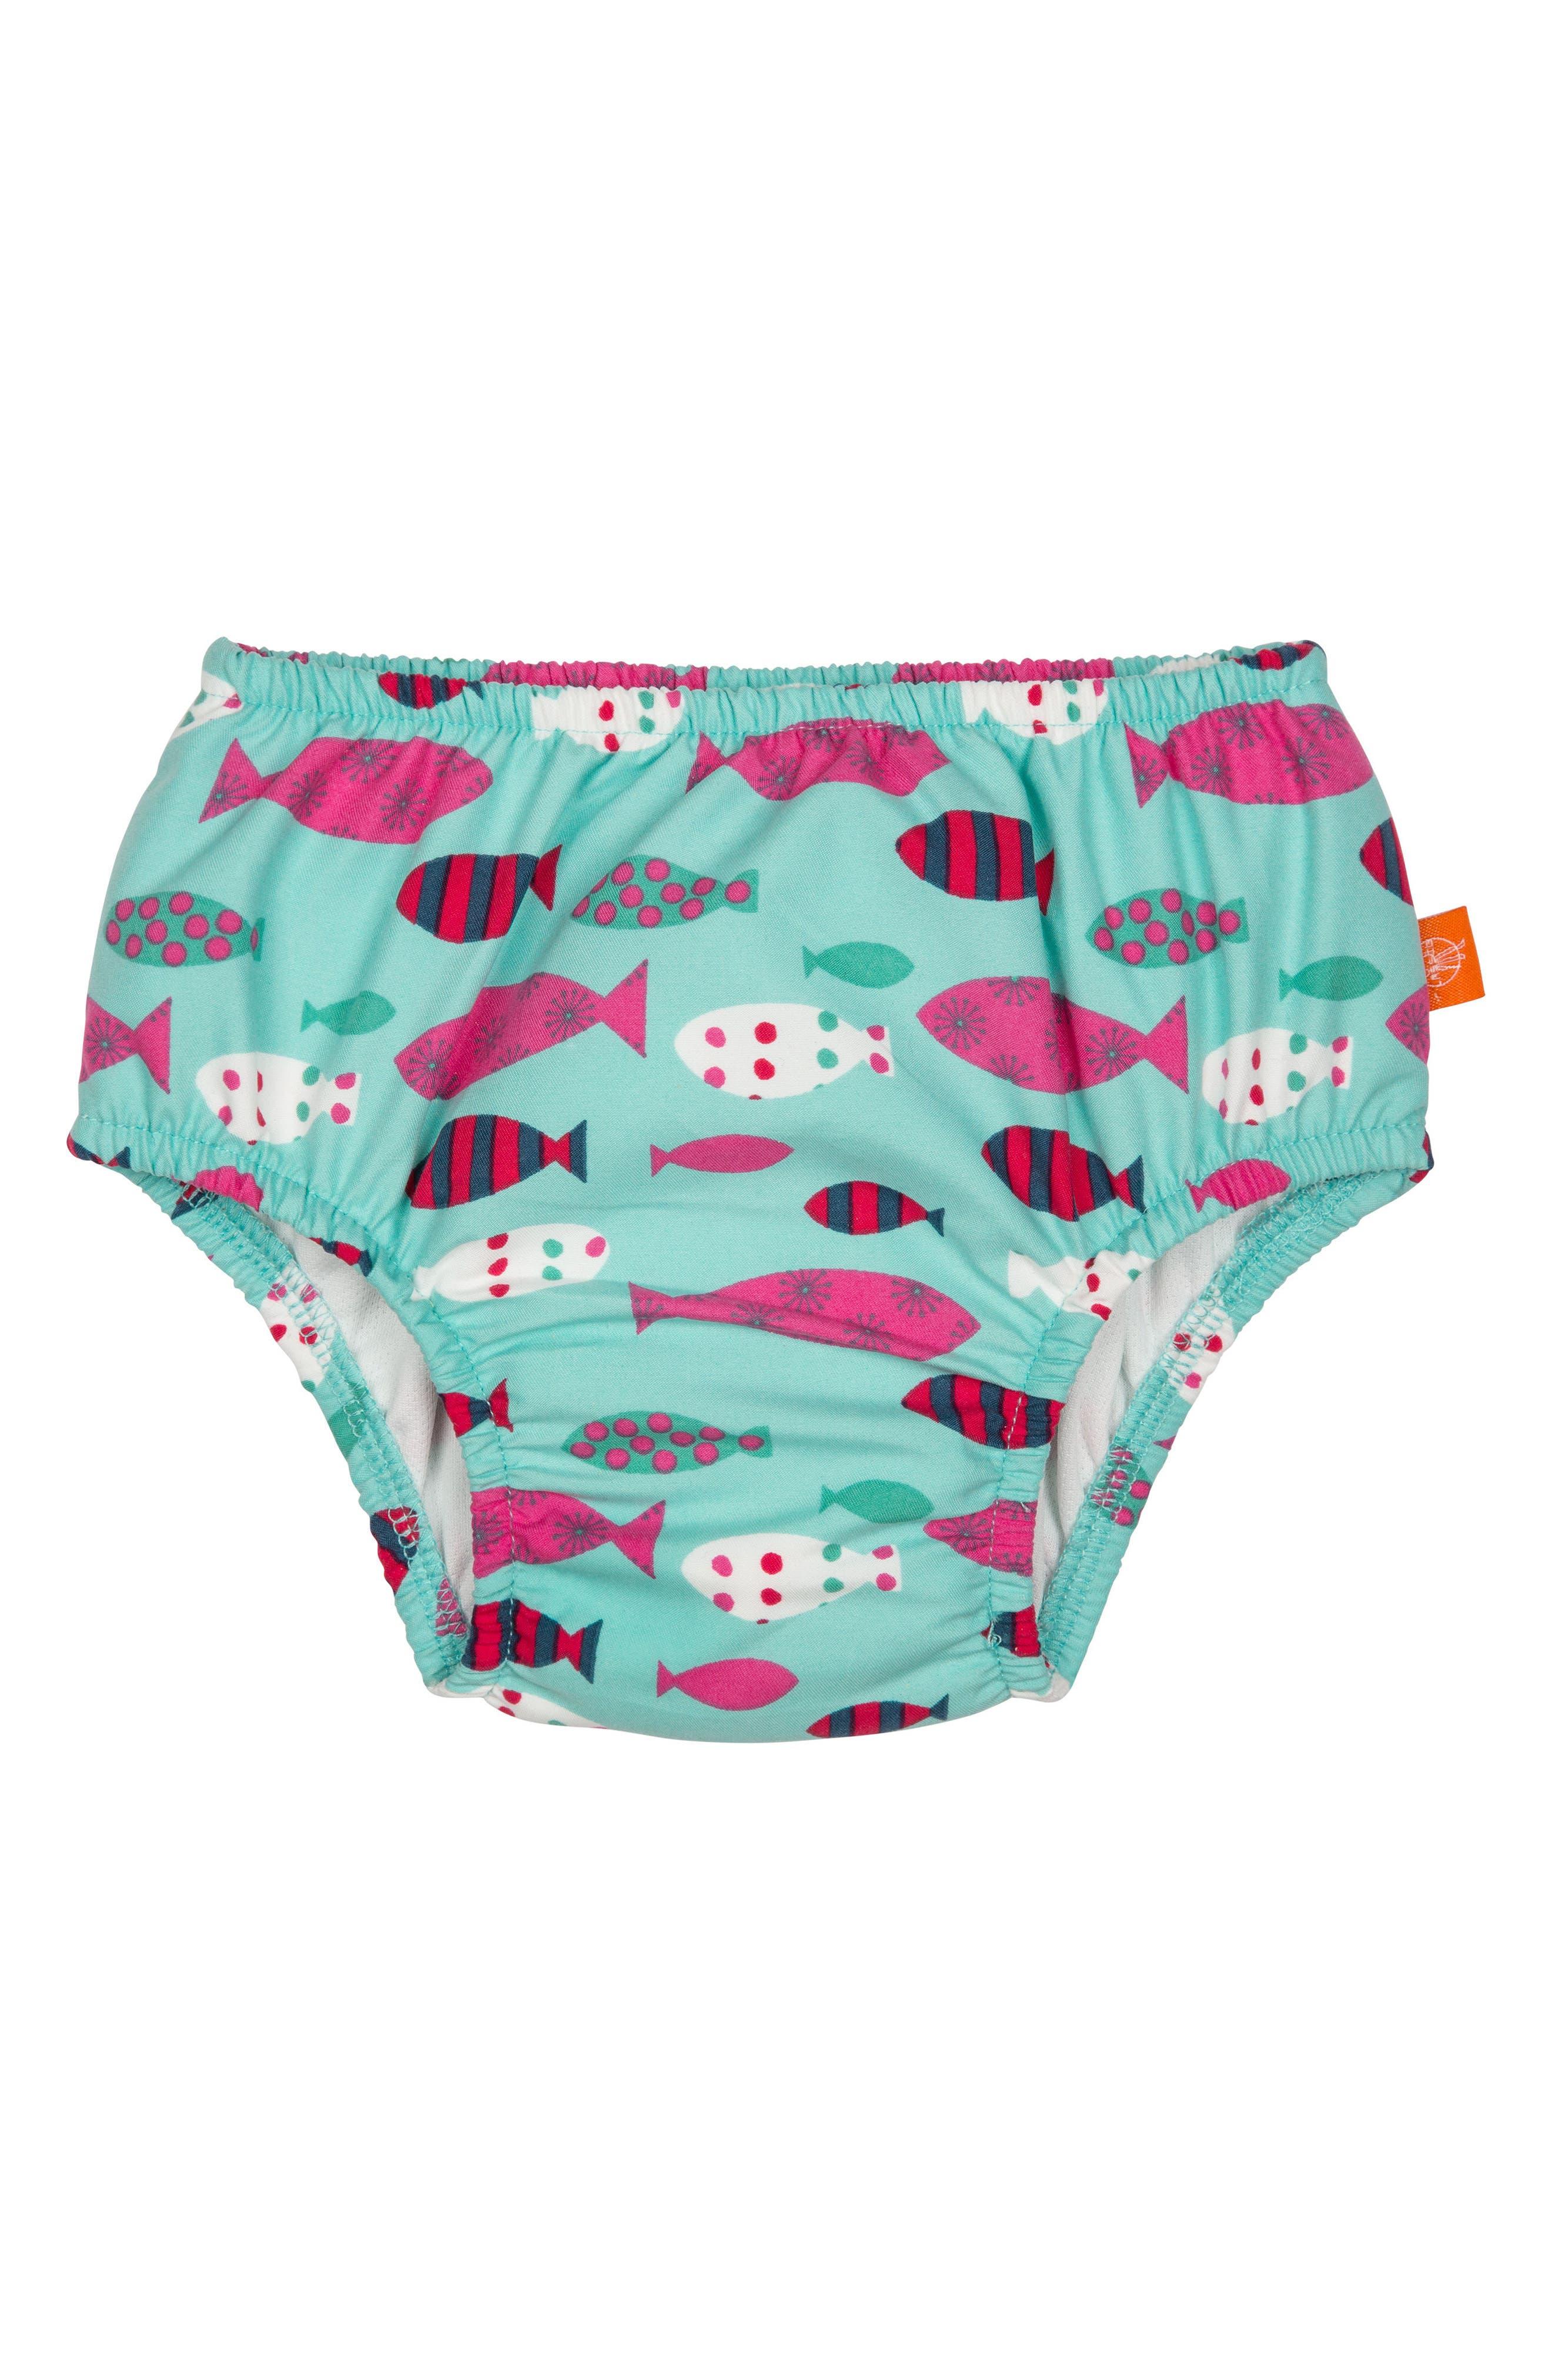 Mr. Fish Swim Diaper Cover,                         Main,                         color, 400